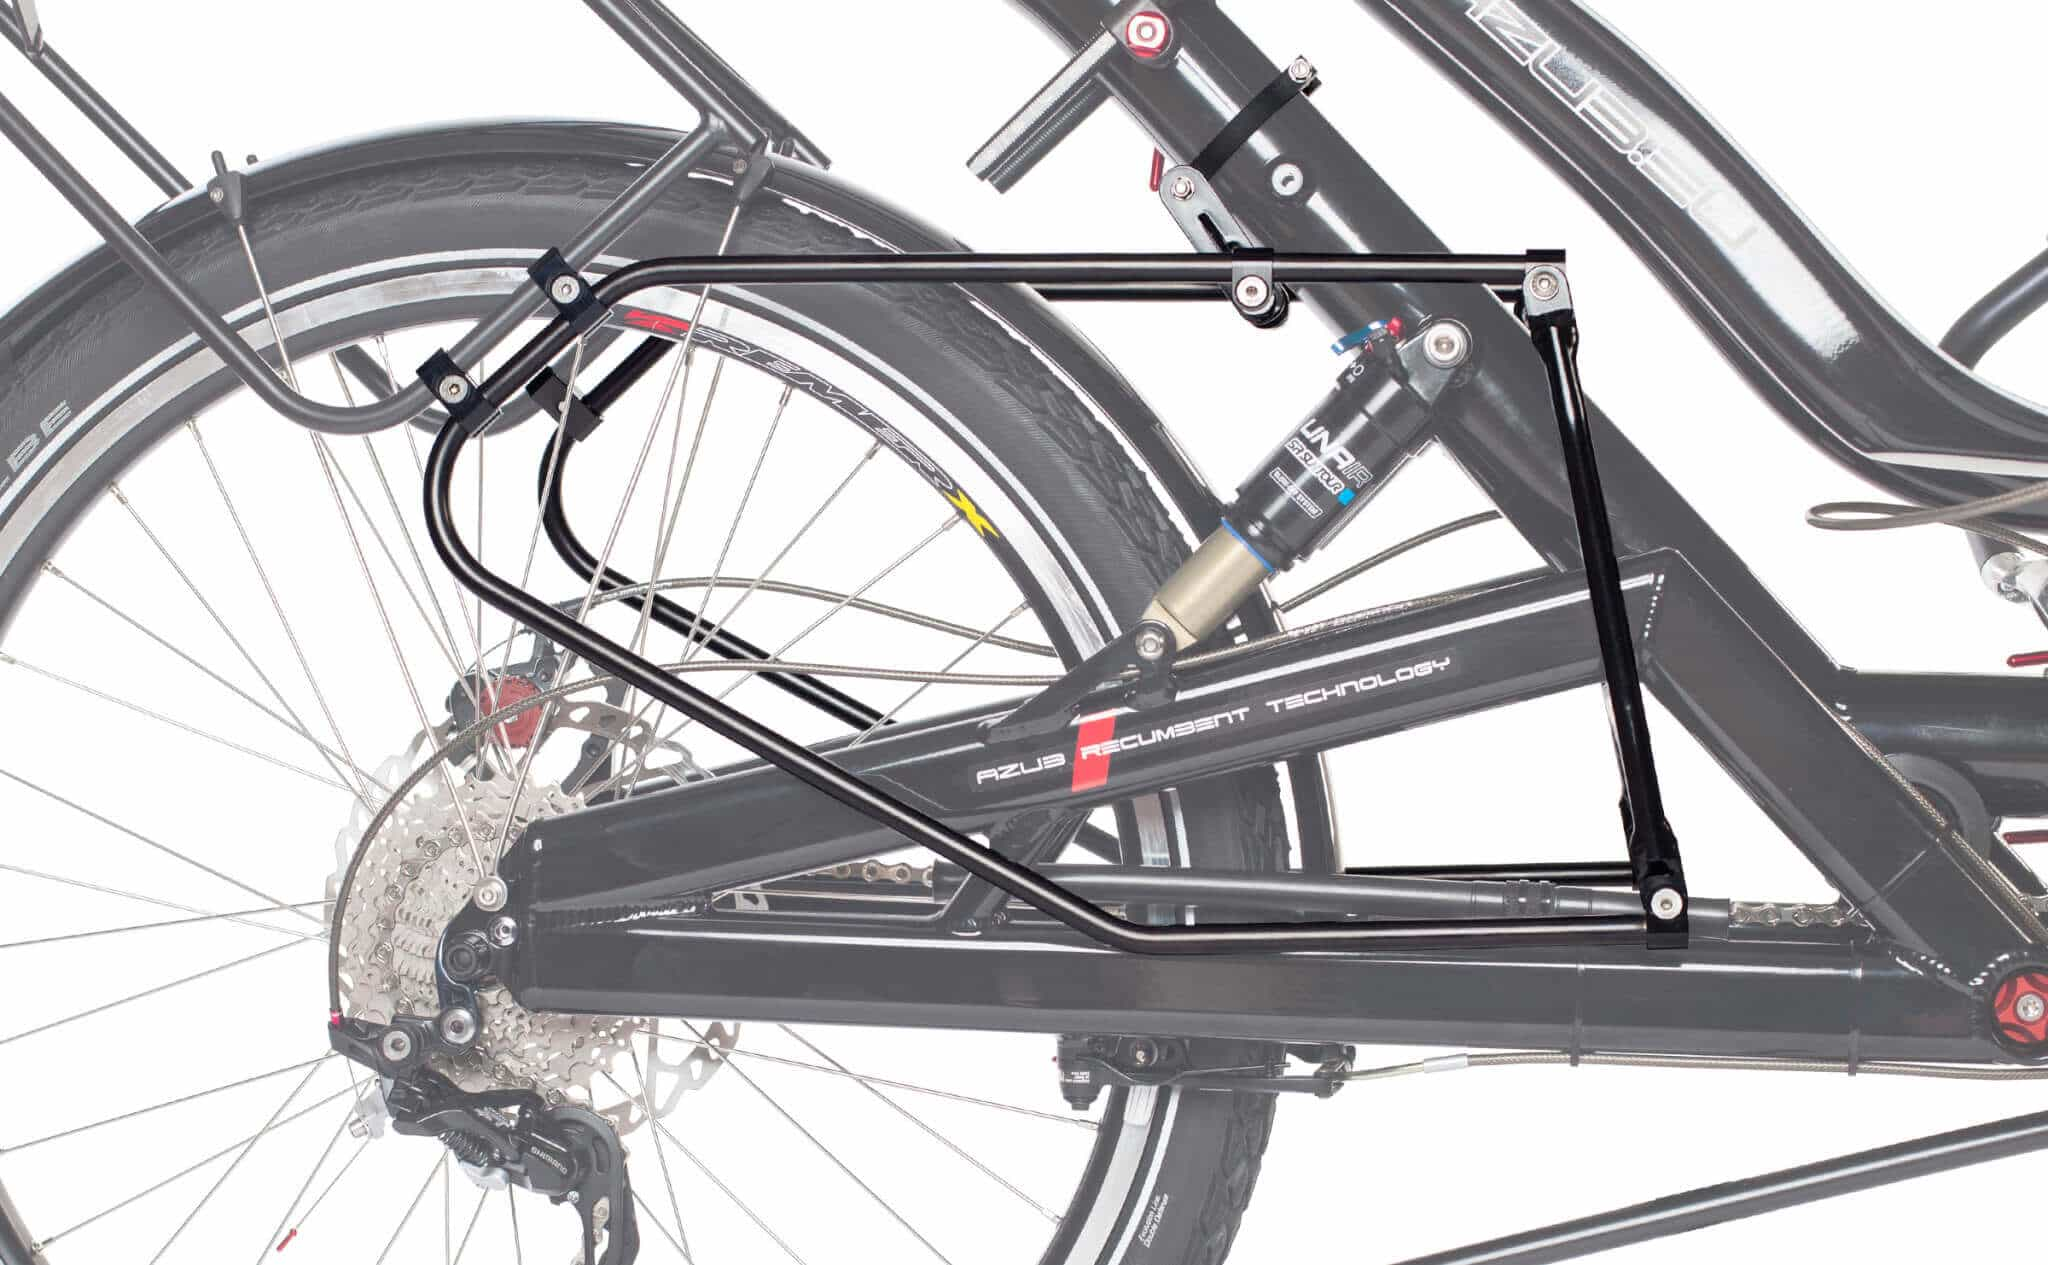 expedition-extension-of-standard-carrier-for-azub-bikes-expedicni-rozsireni-standartniho-nosice-pro-lehokola-azub-on-twin